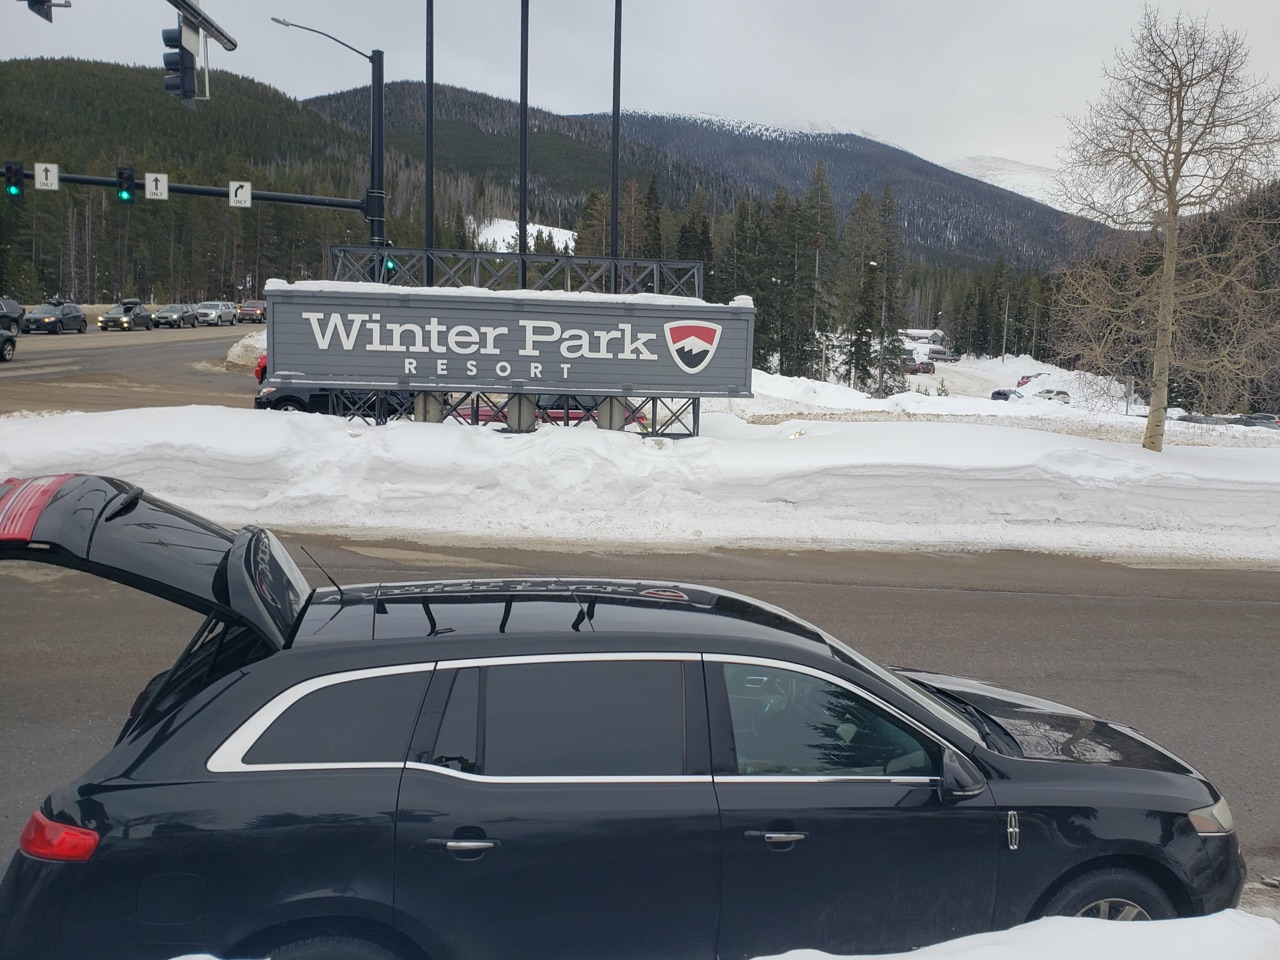 black Lincoln town car outside Winter Park Resort